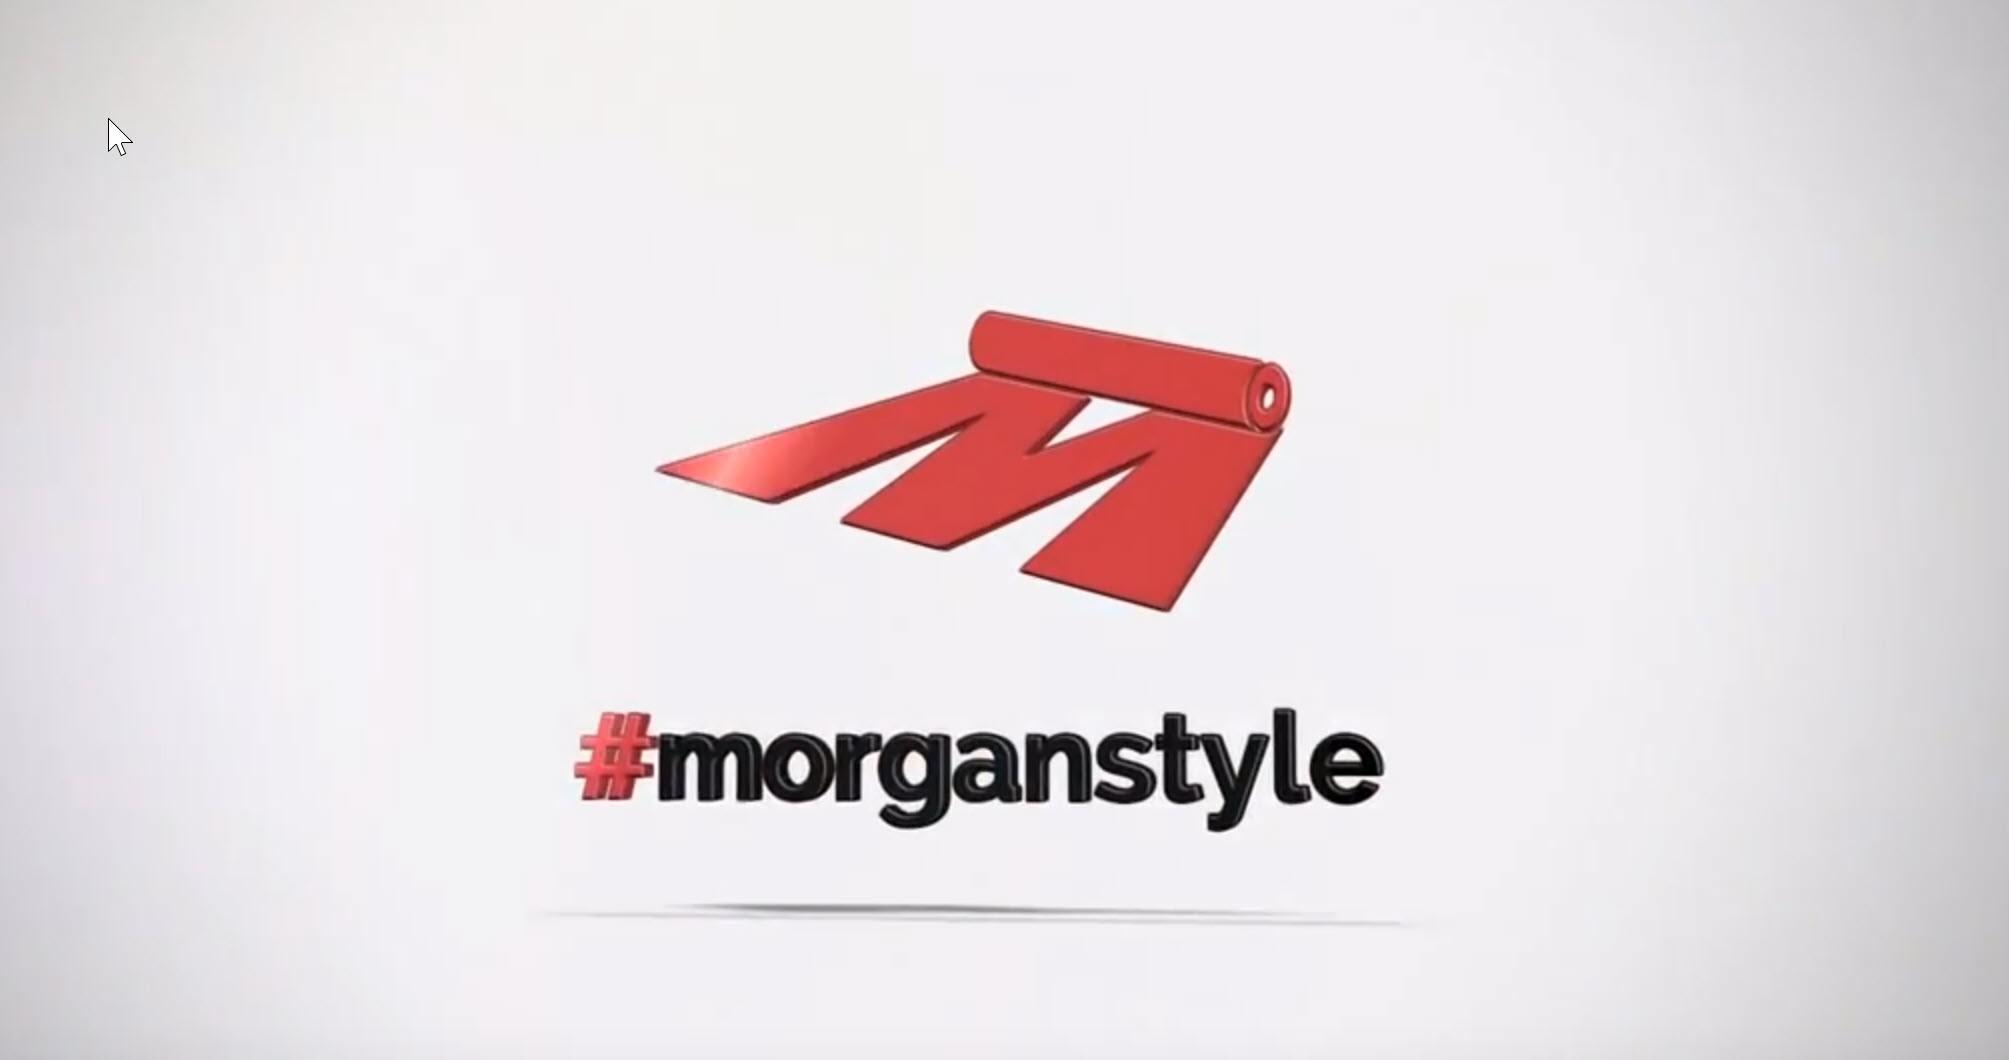 Морган Техника в новом корпоративном имидже